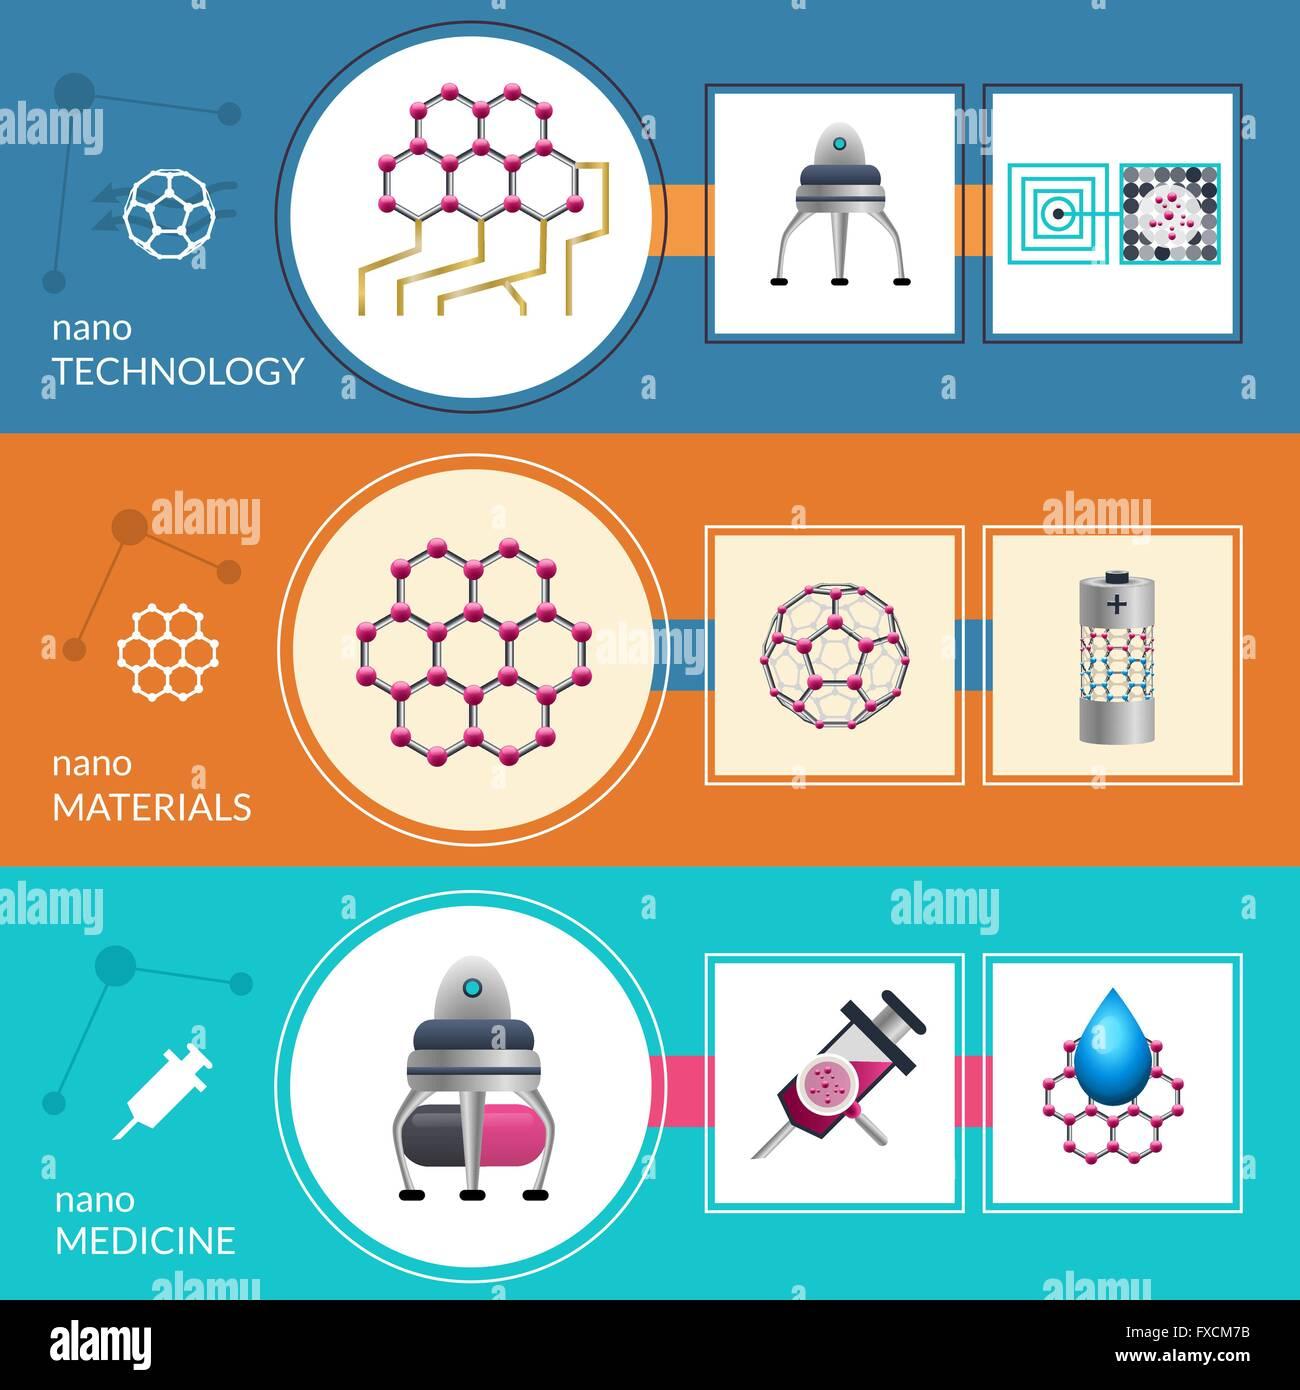 Nanotechnology concept 3 flat banners set - Stock Image